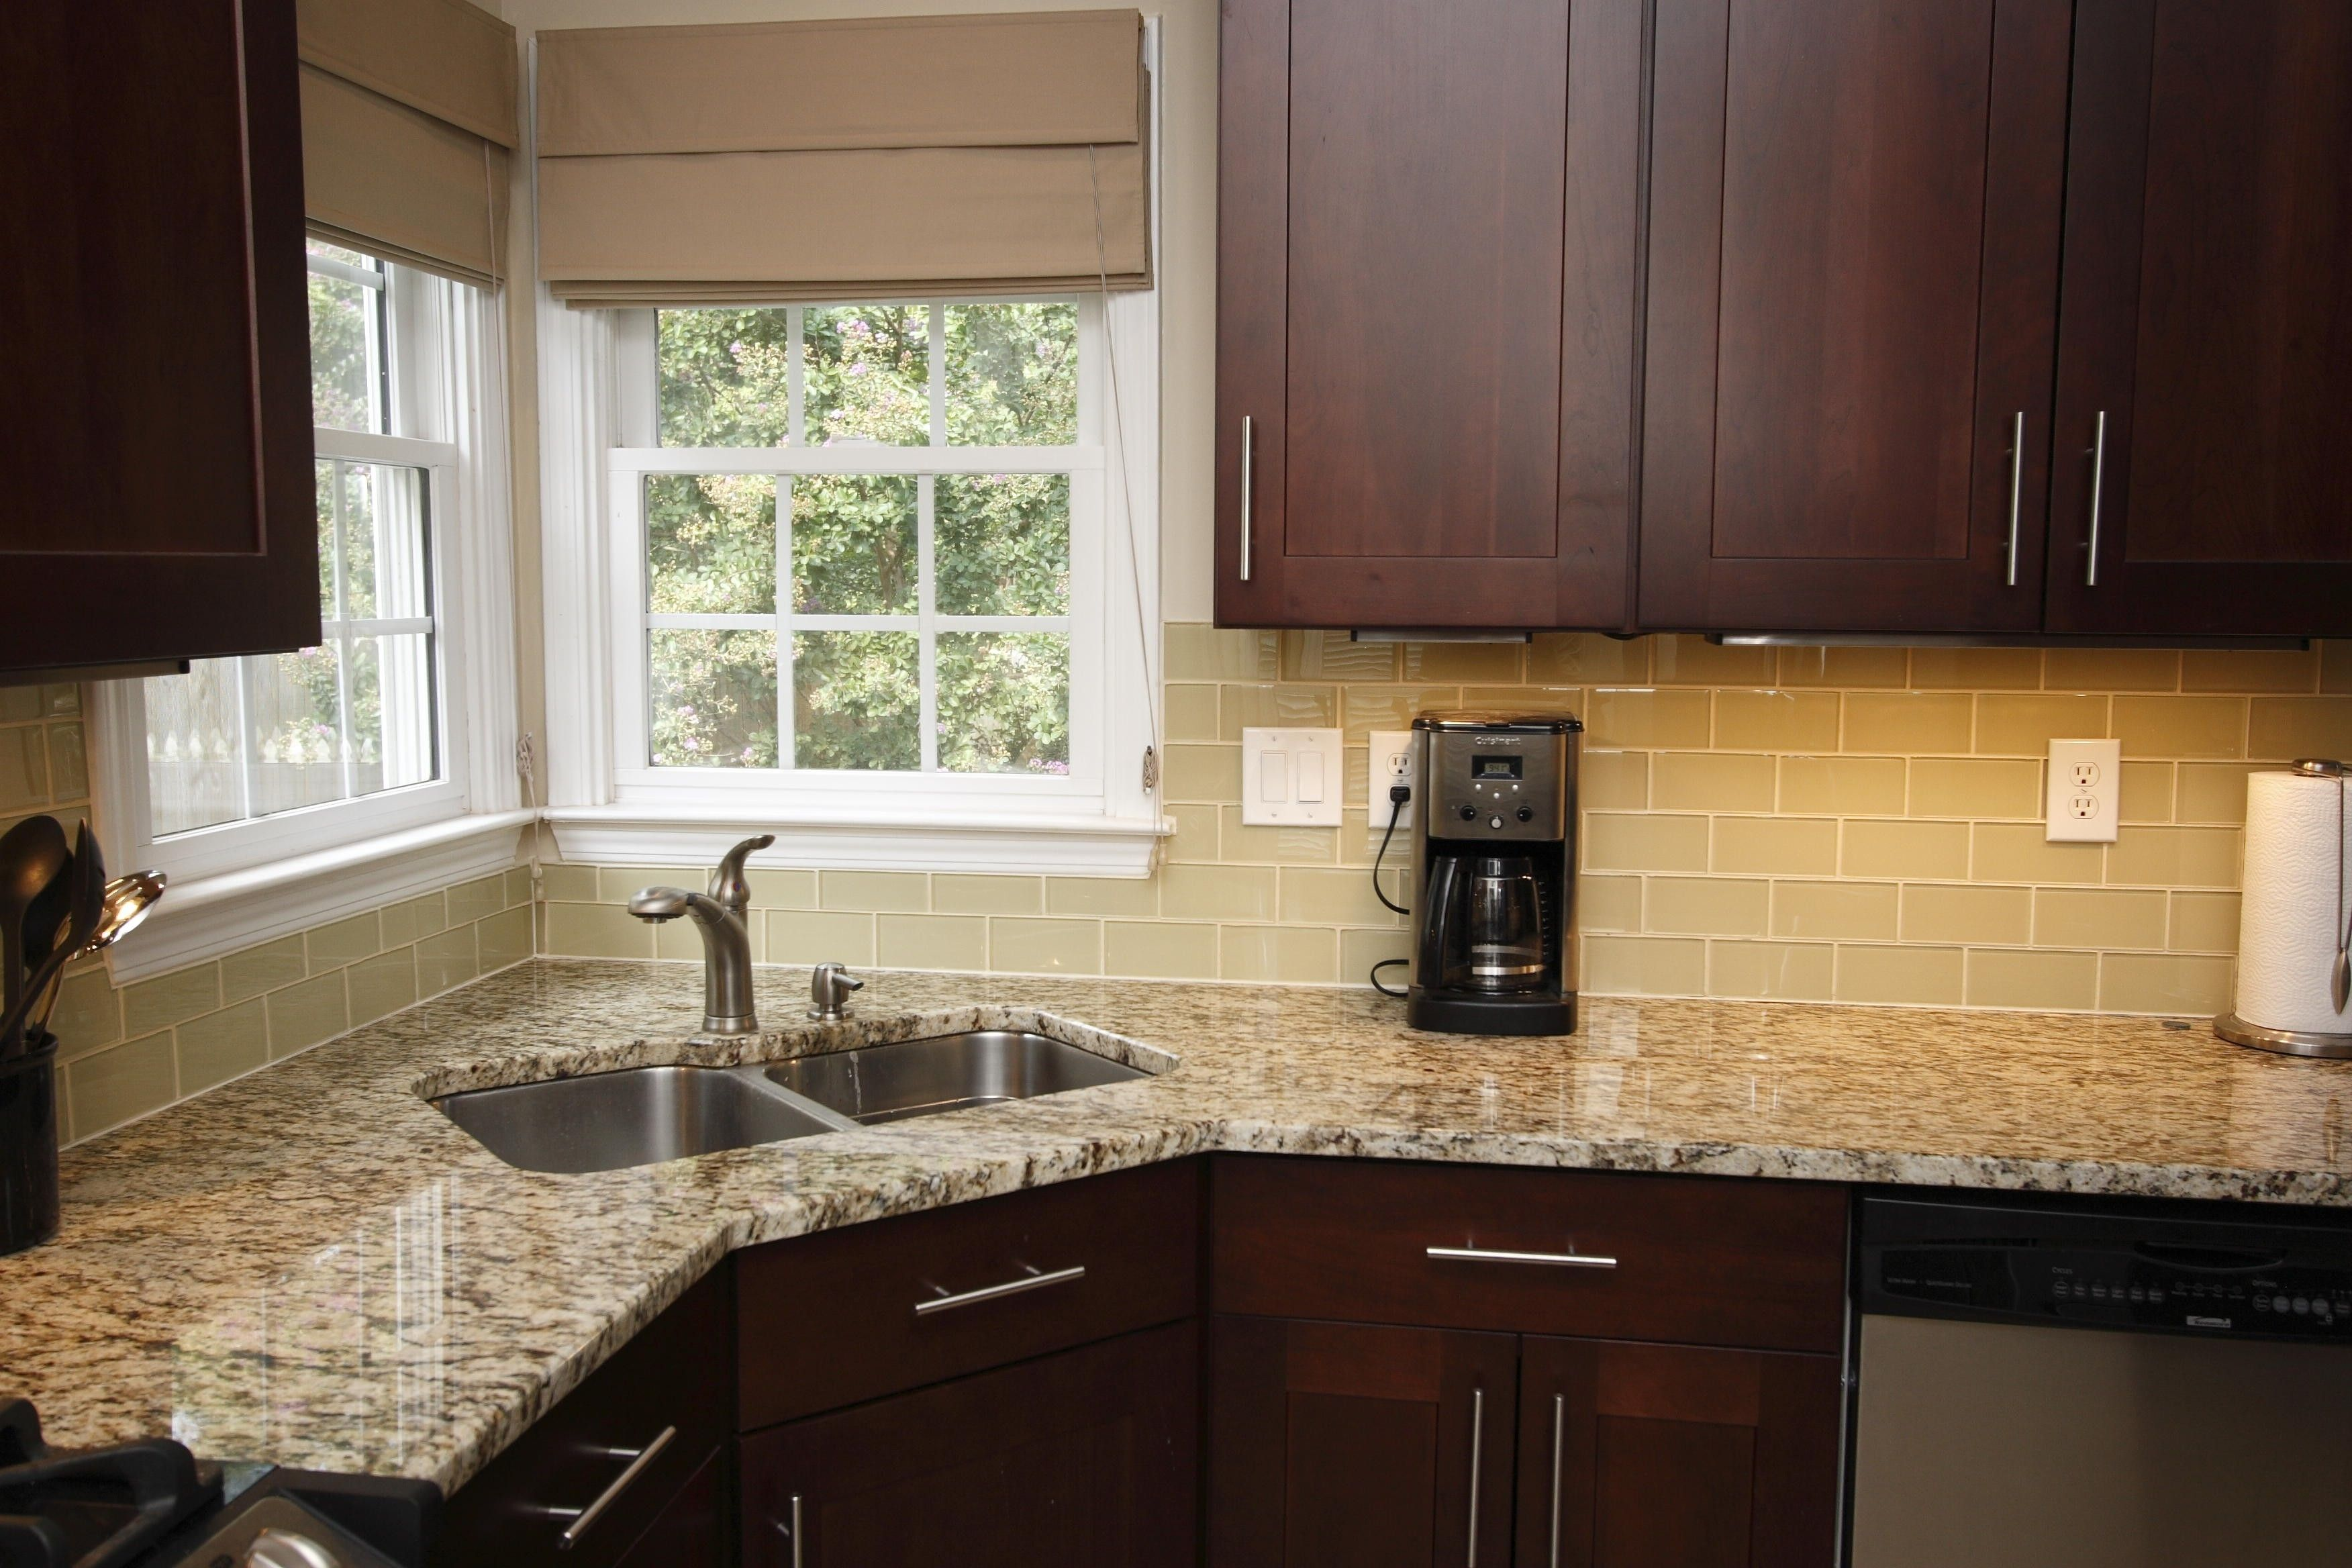 Wallpaper Stunning Corner Kitchen Sink Ideas With High Gloss Sink October 5 2016 Download 3504 X 2 Corner Sink Kitchen Kitchen Remodel Home Depot Kitchen